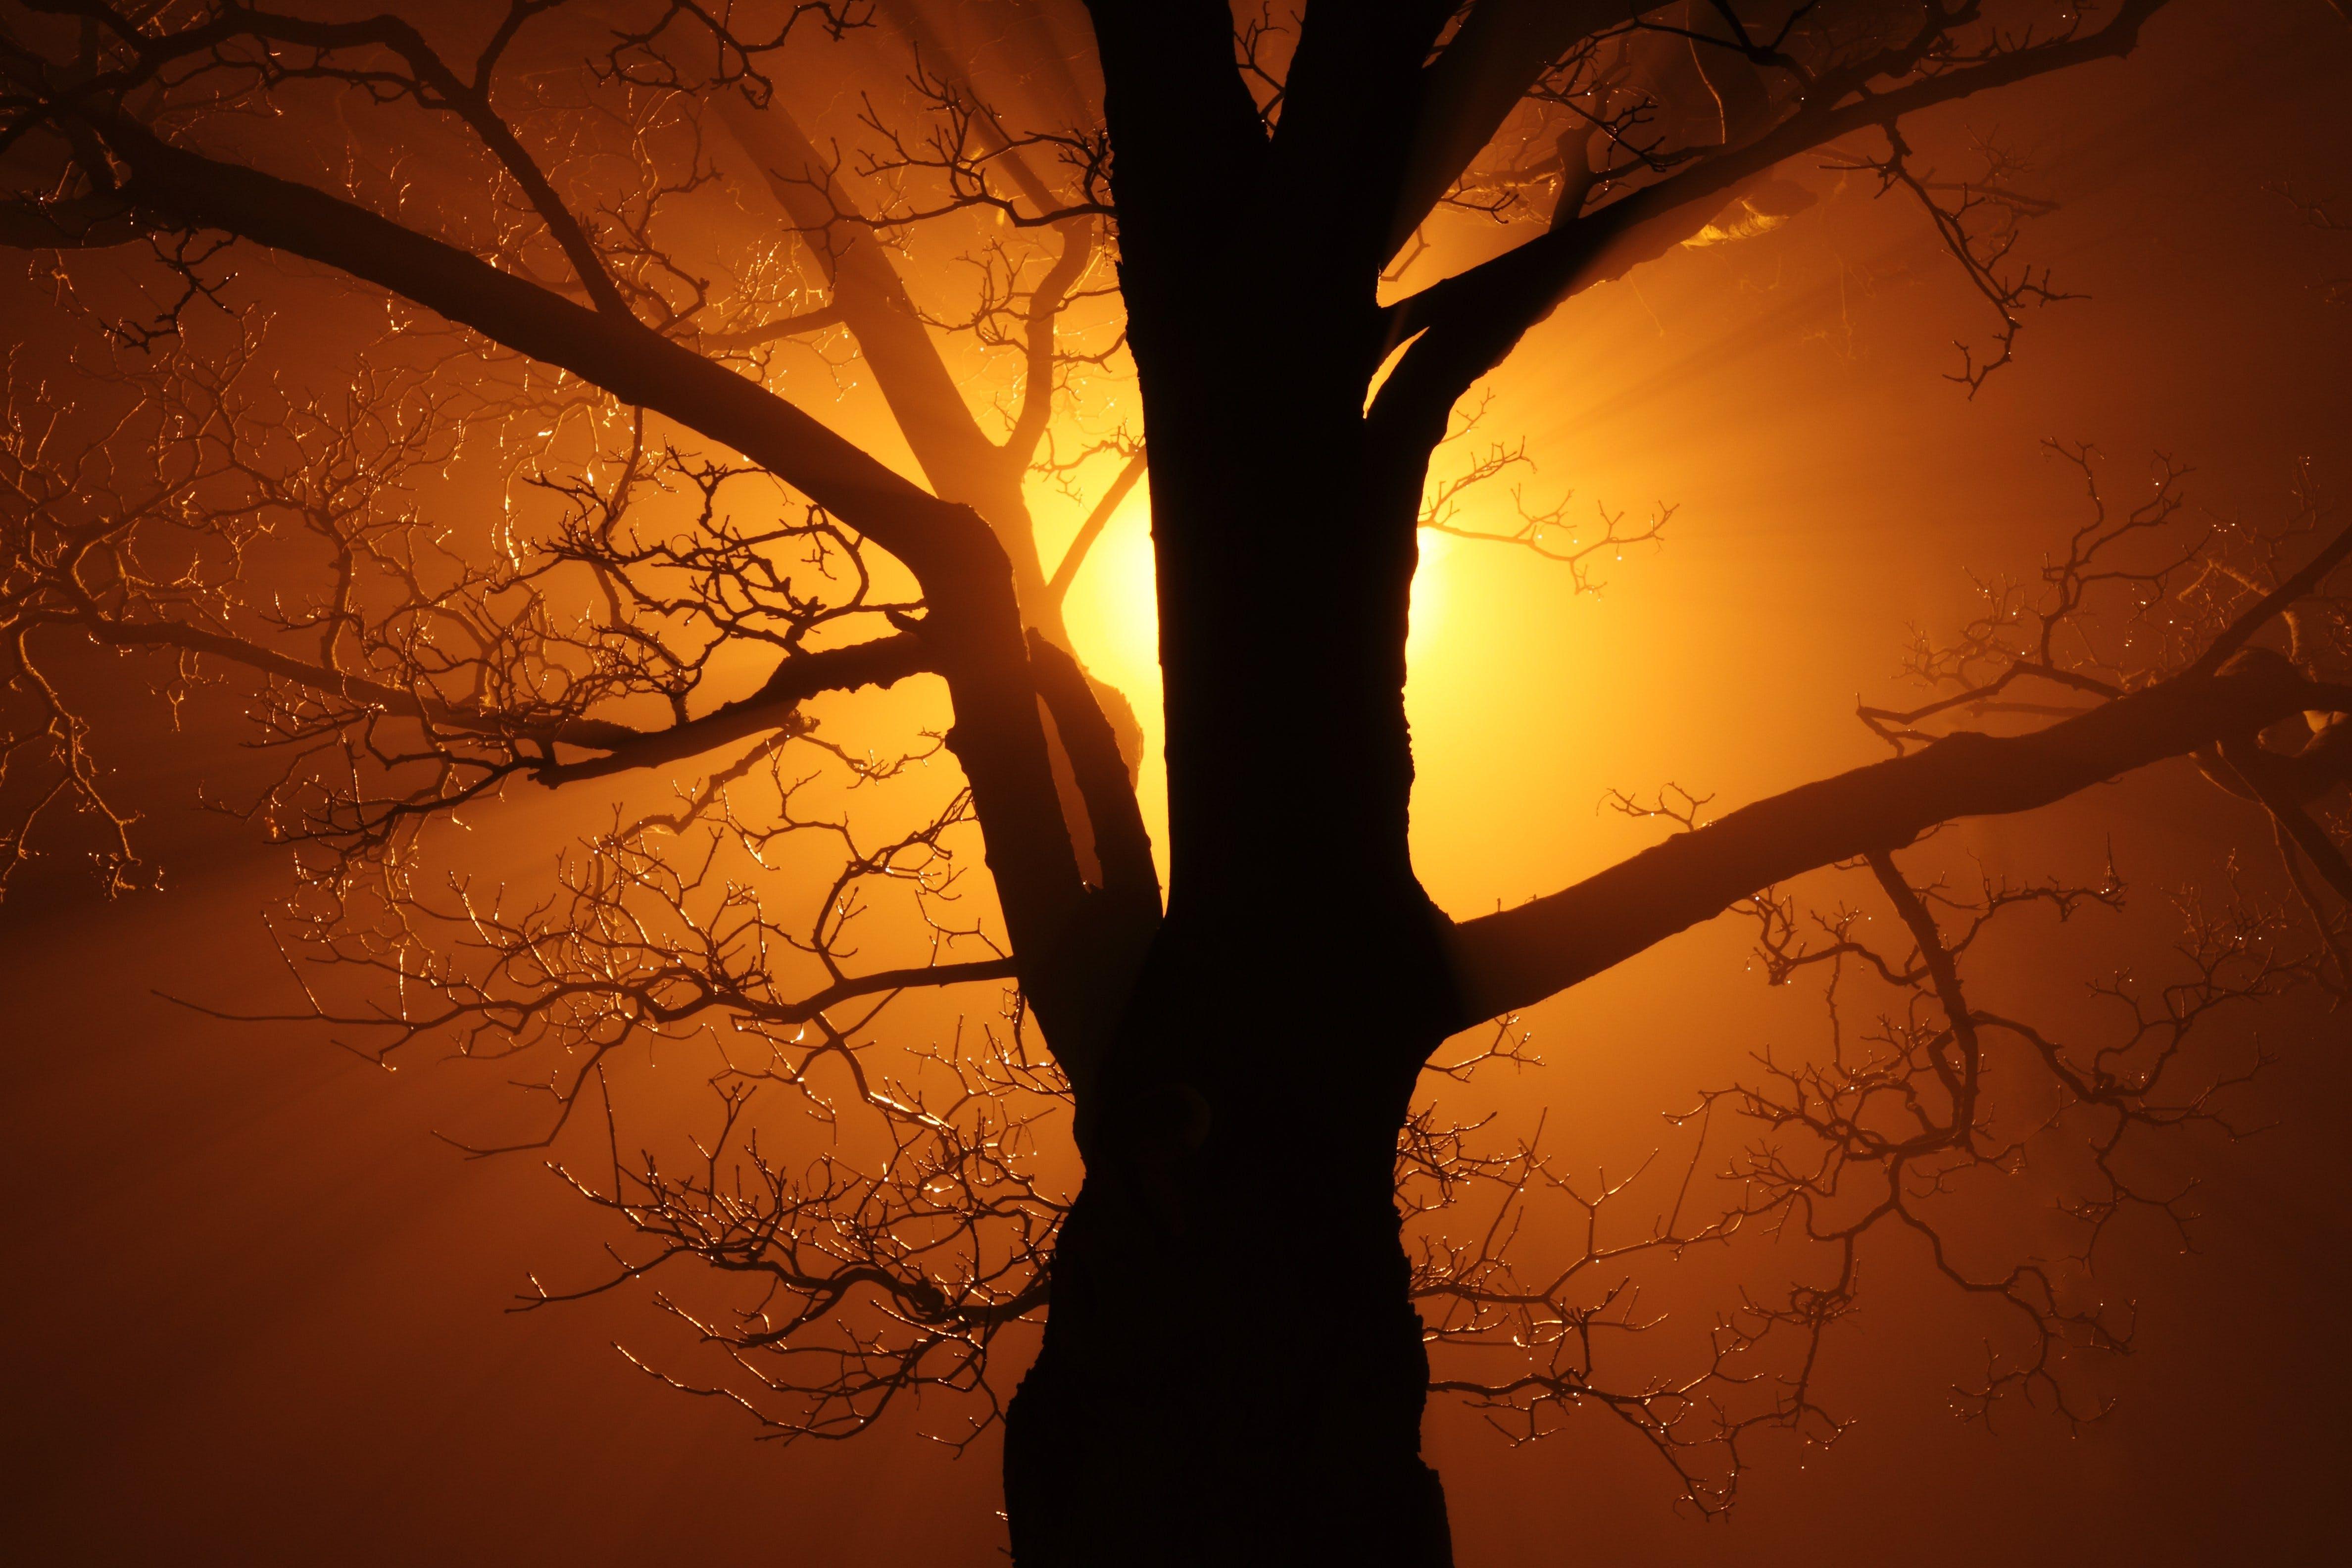 Silhouette of Bare Tree Against Sunlight